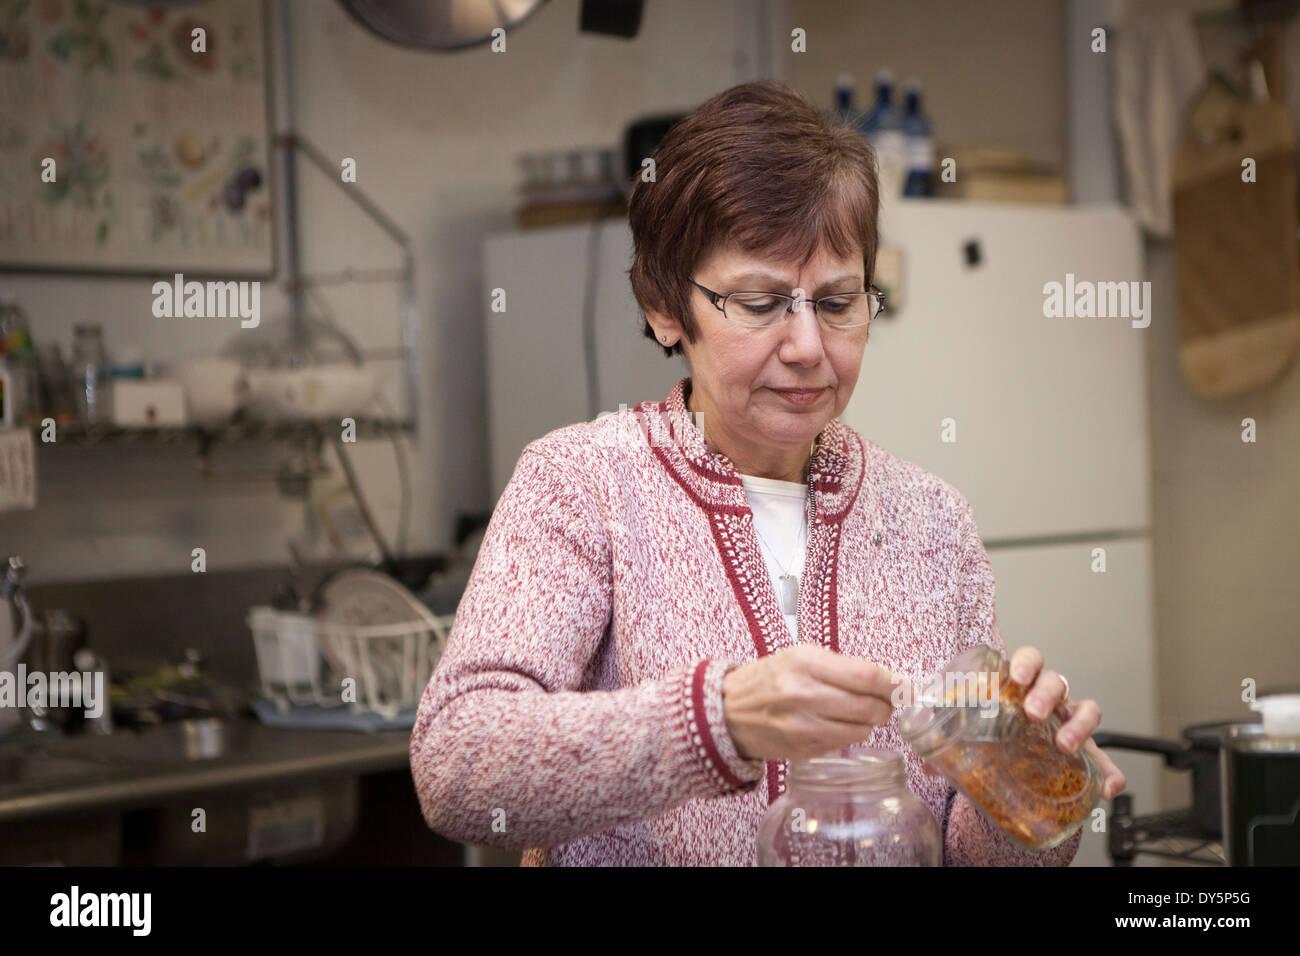 Gesunde Lebensmittel-Shop-Besitzer setzen Kräuter in Gläsern Stockbild